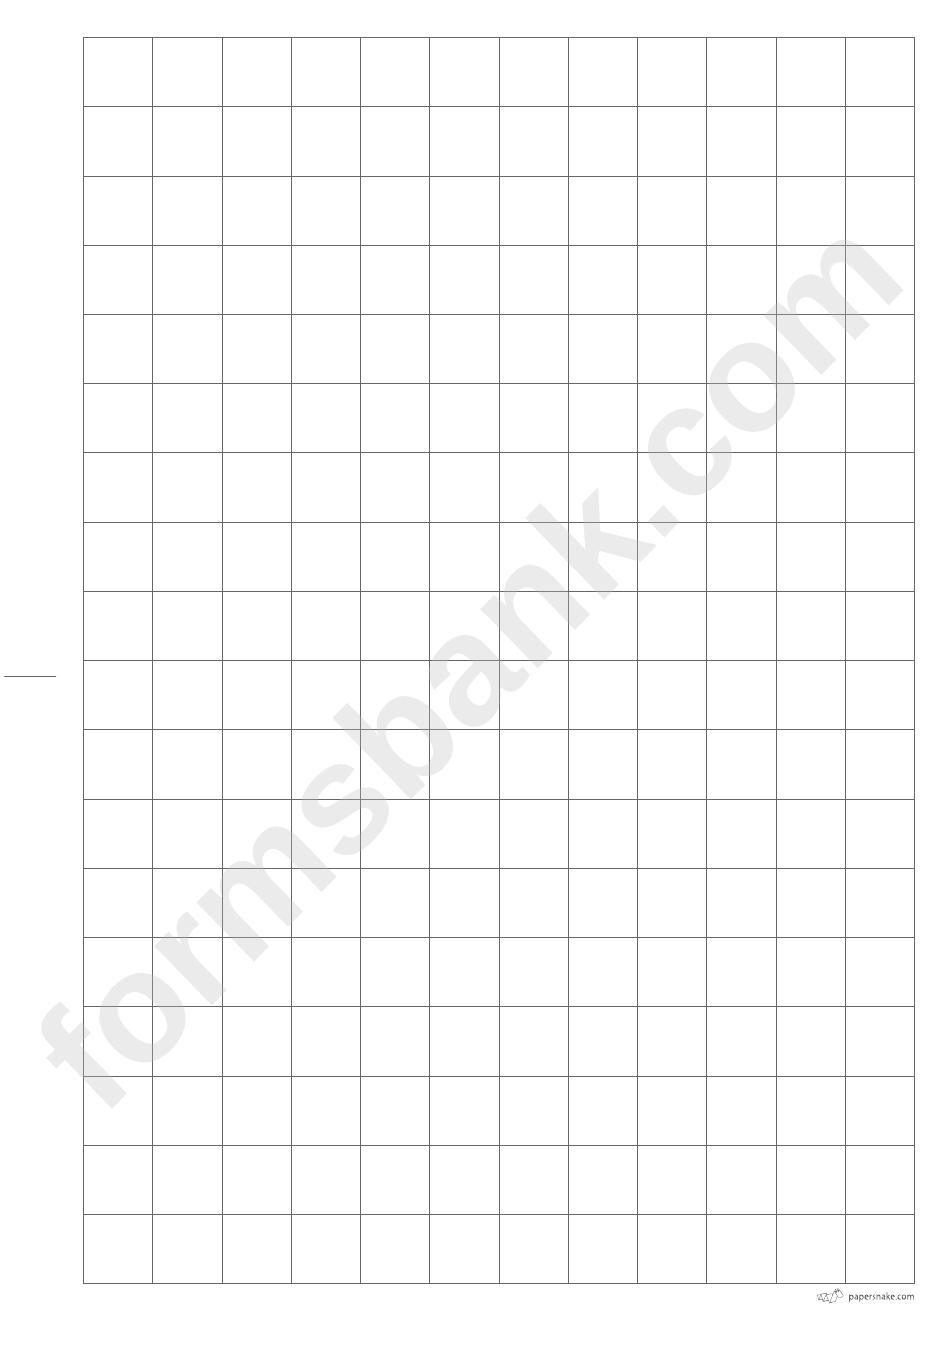 15x15 Squared Paper